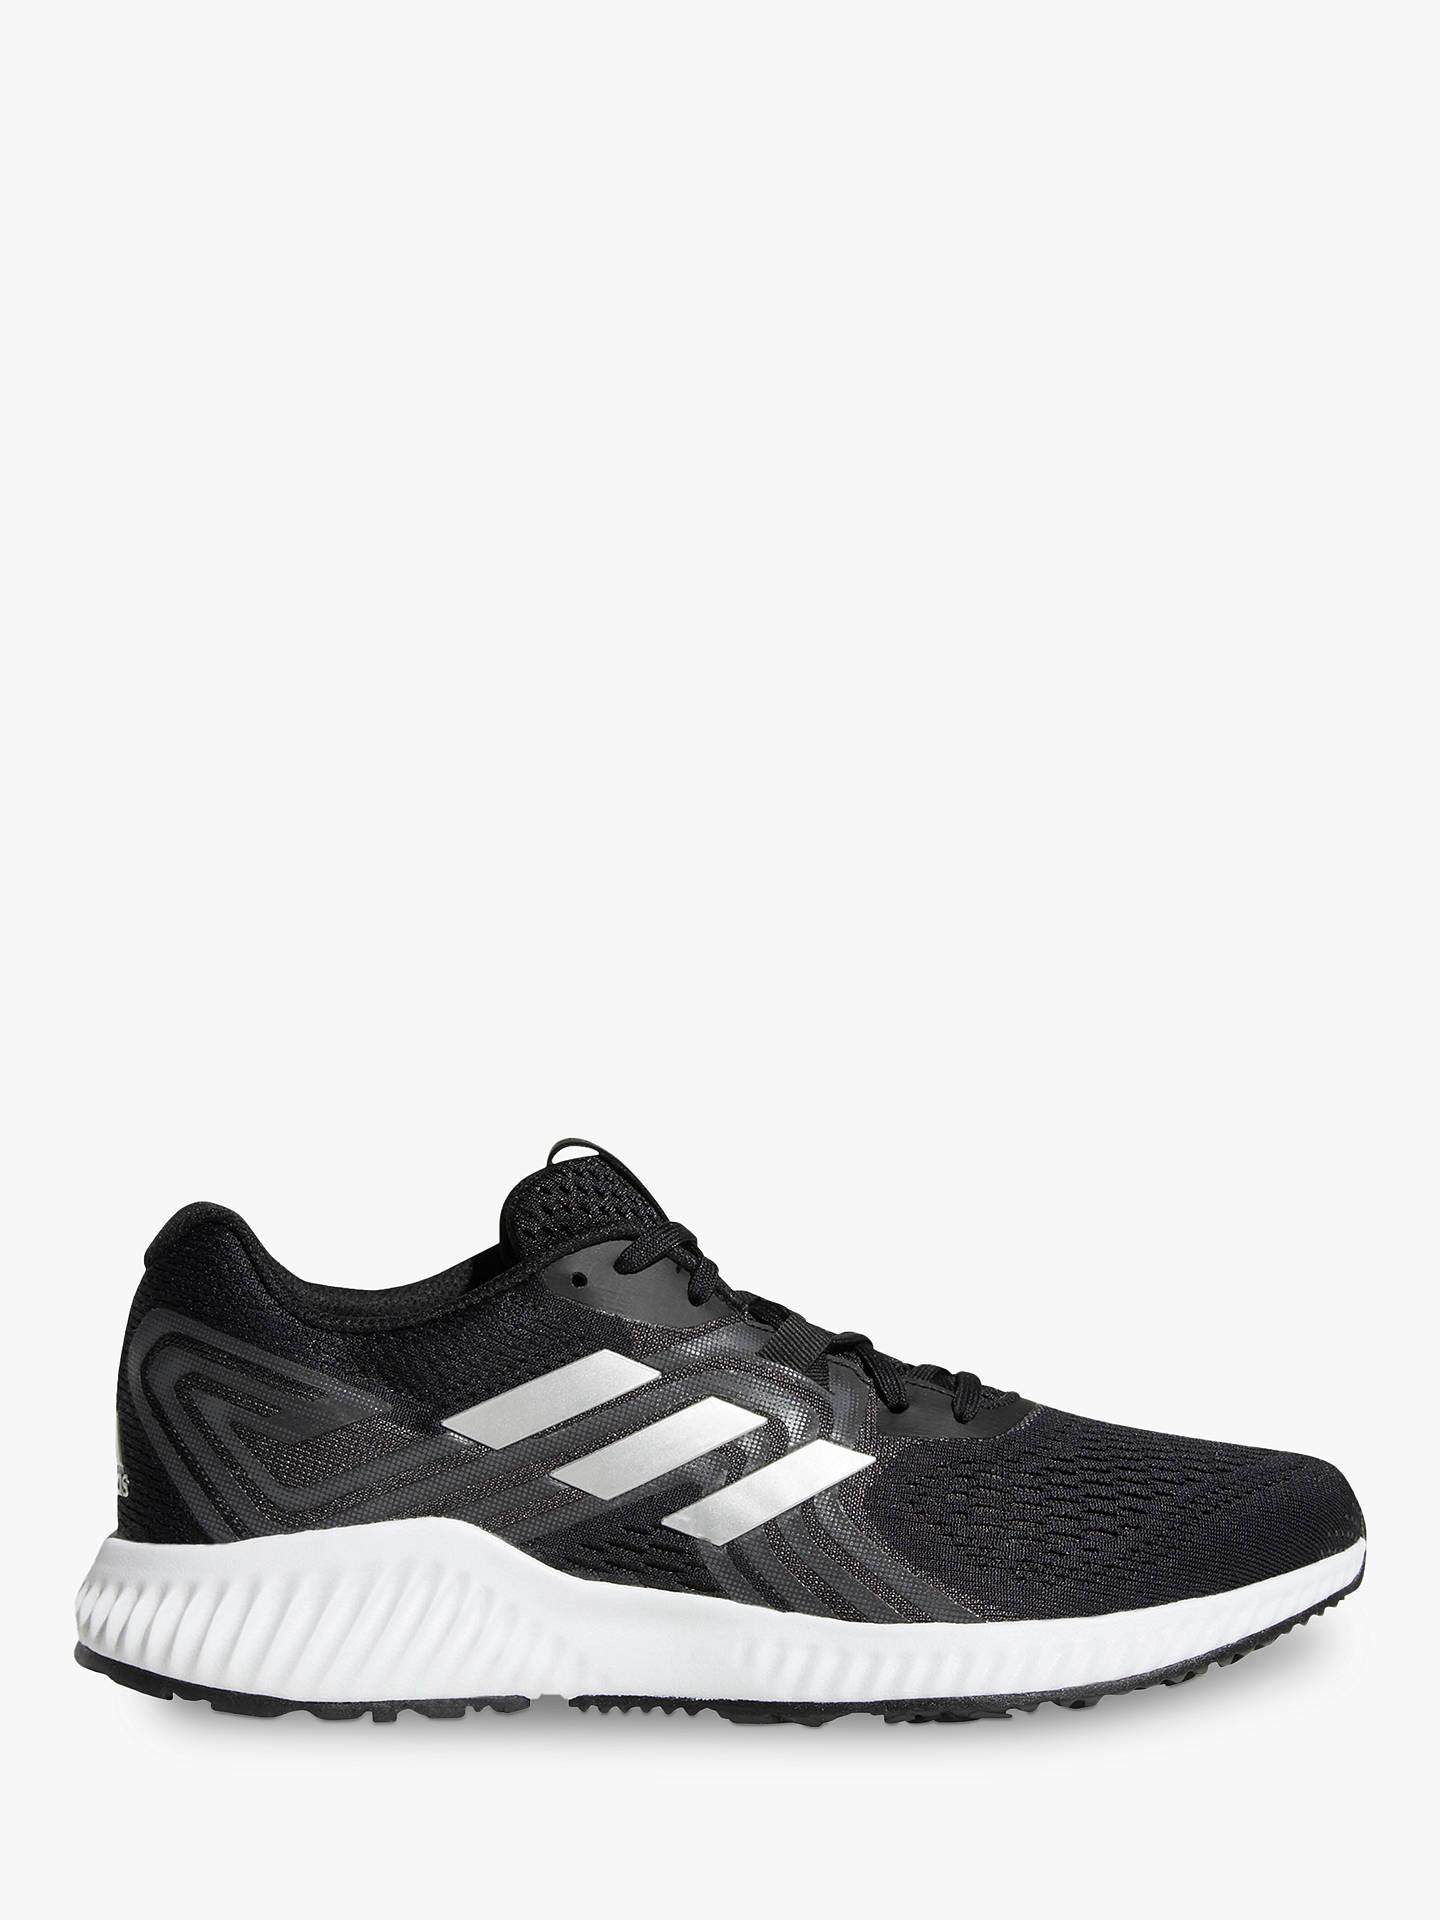 low priced d06e9 2c11e ... Buy adidas Aerobounce 2 Men s Running Shoes, Core Black Silver, 7  Online at ...